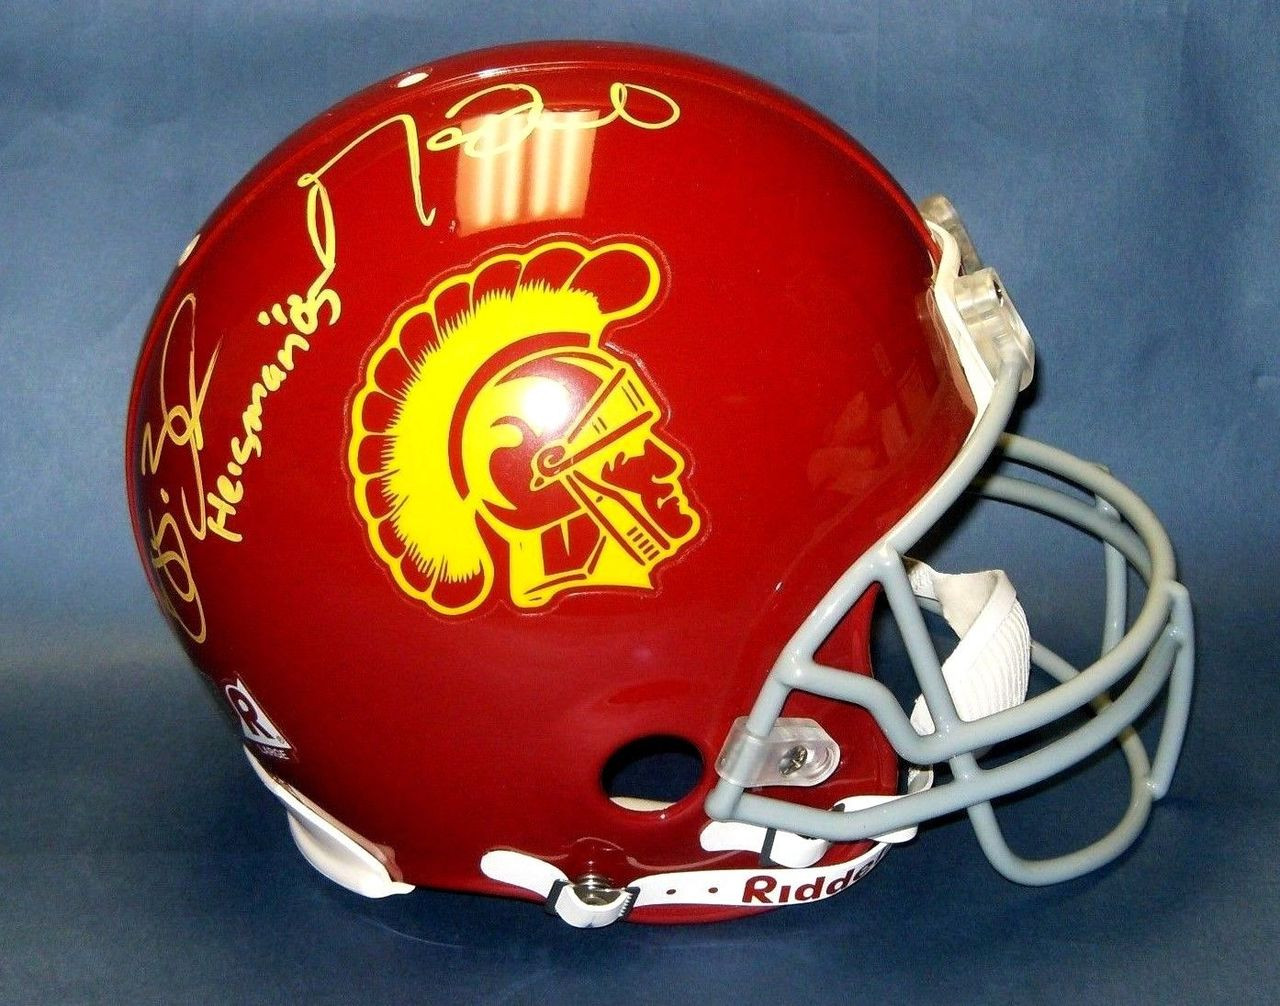 Riddell USC Trojans Pro Line Helmet